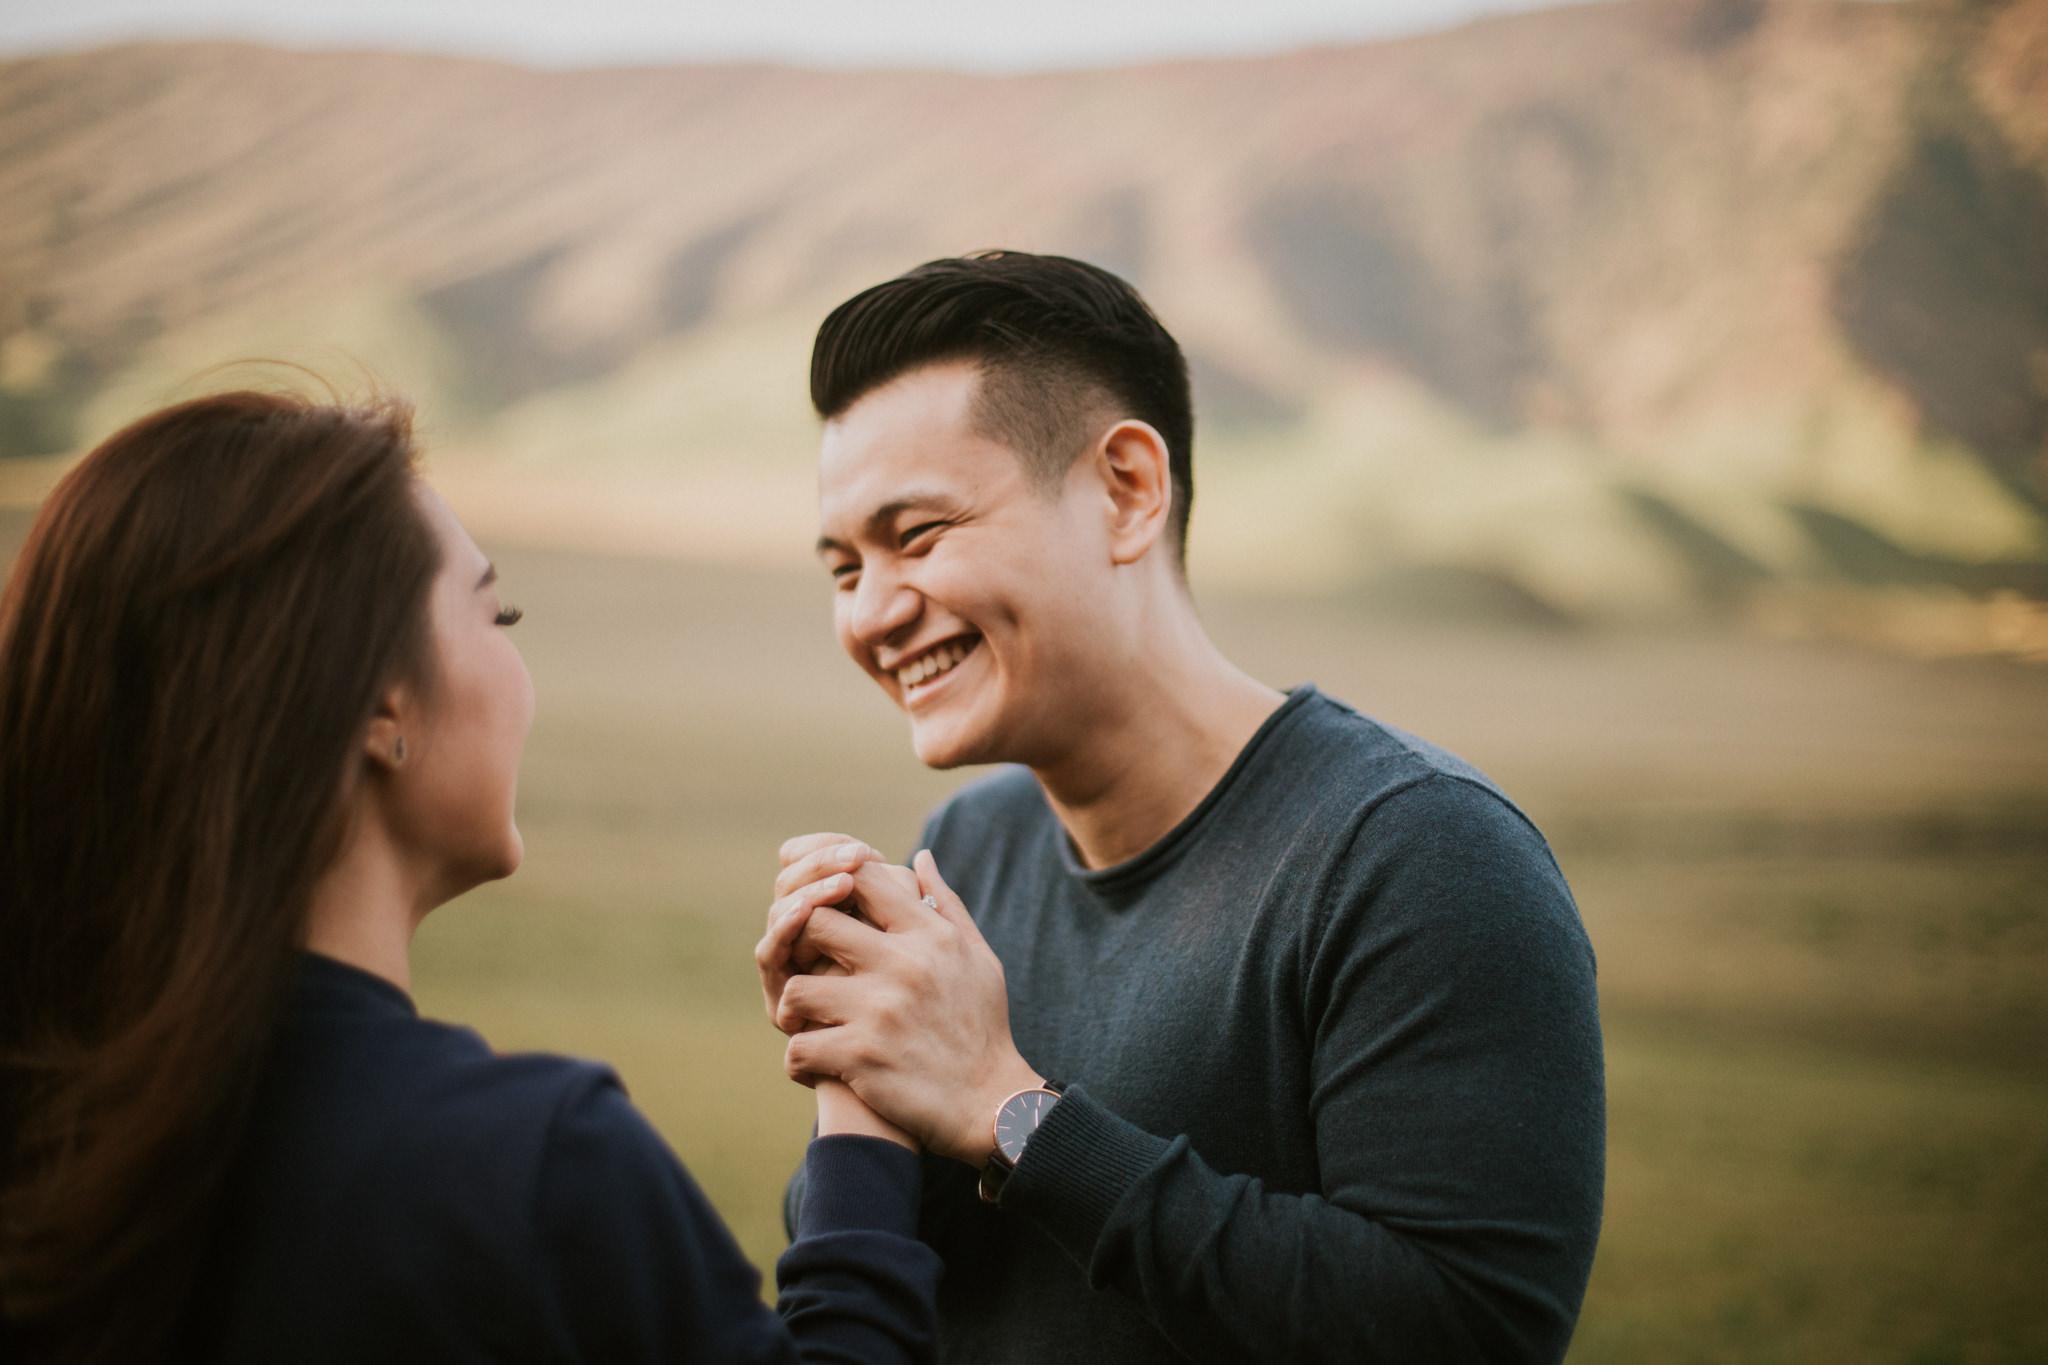 casual_mountbromo_newzealand_destination_elopement_weddingphotographer_christineadel (3).JPG